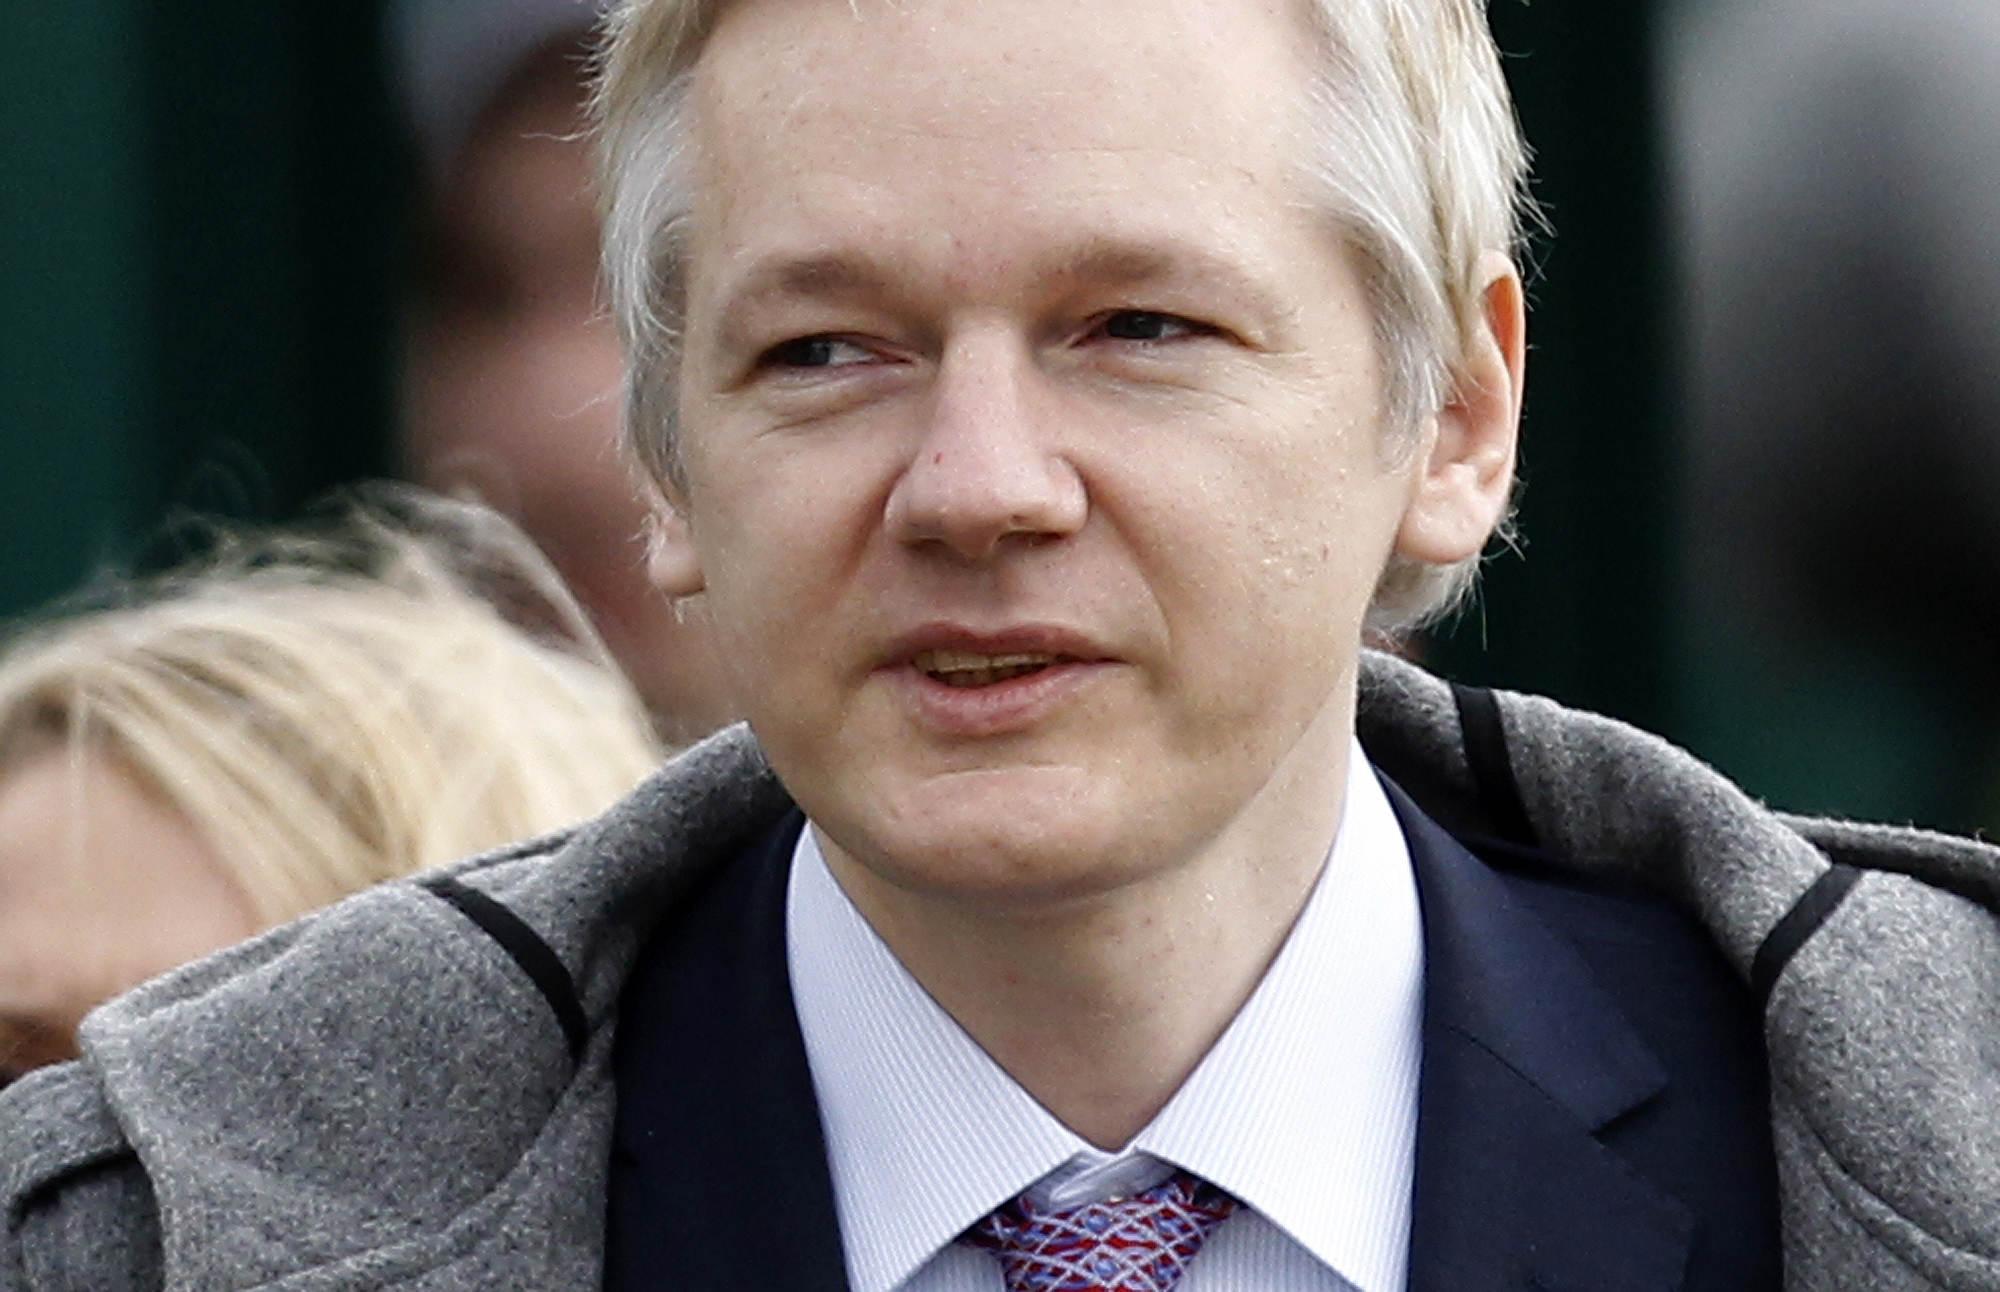 Julian Assange ställer upp på DNA-prov - julian-assange